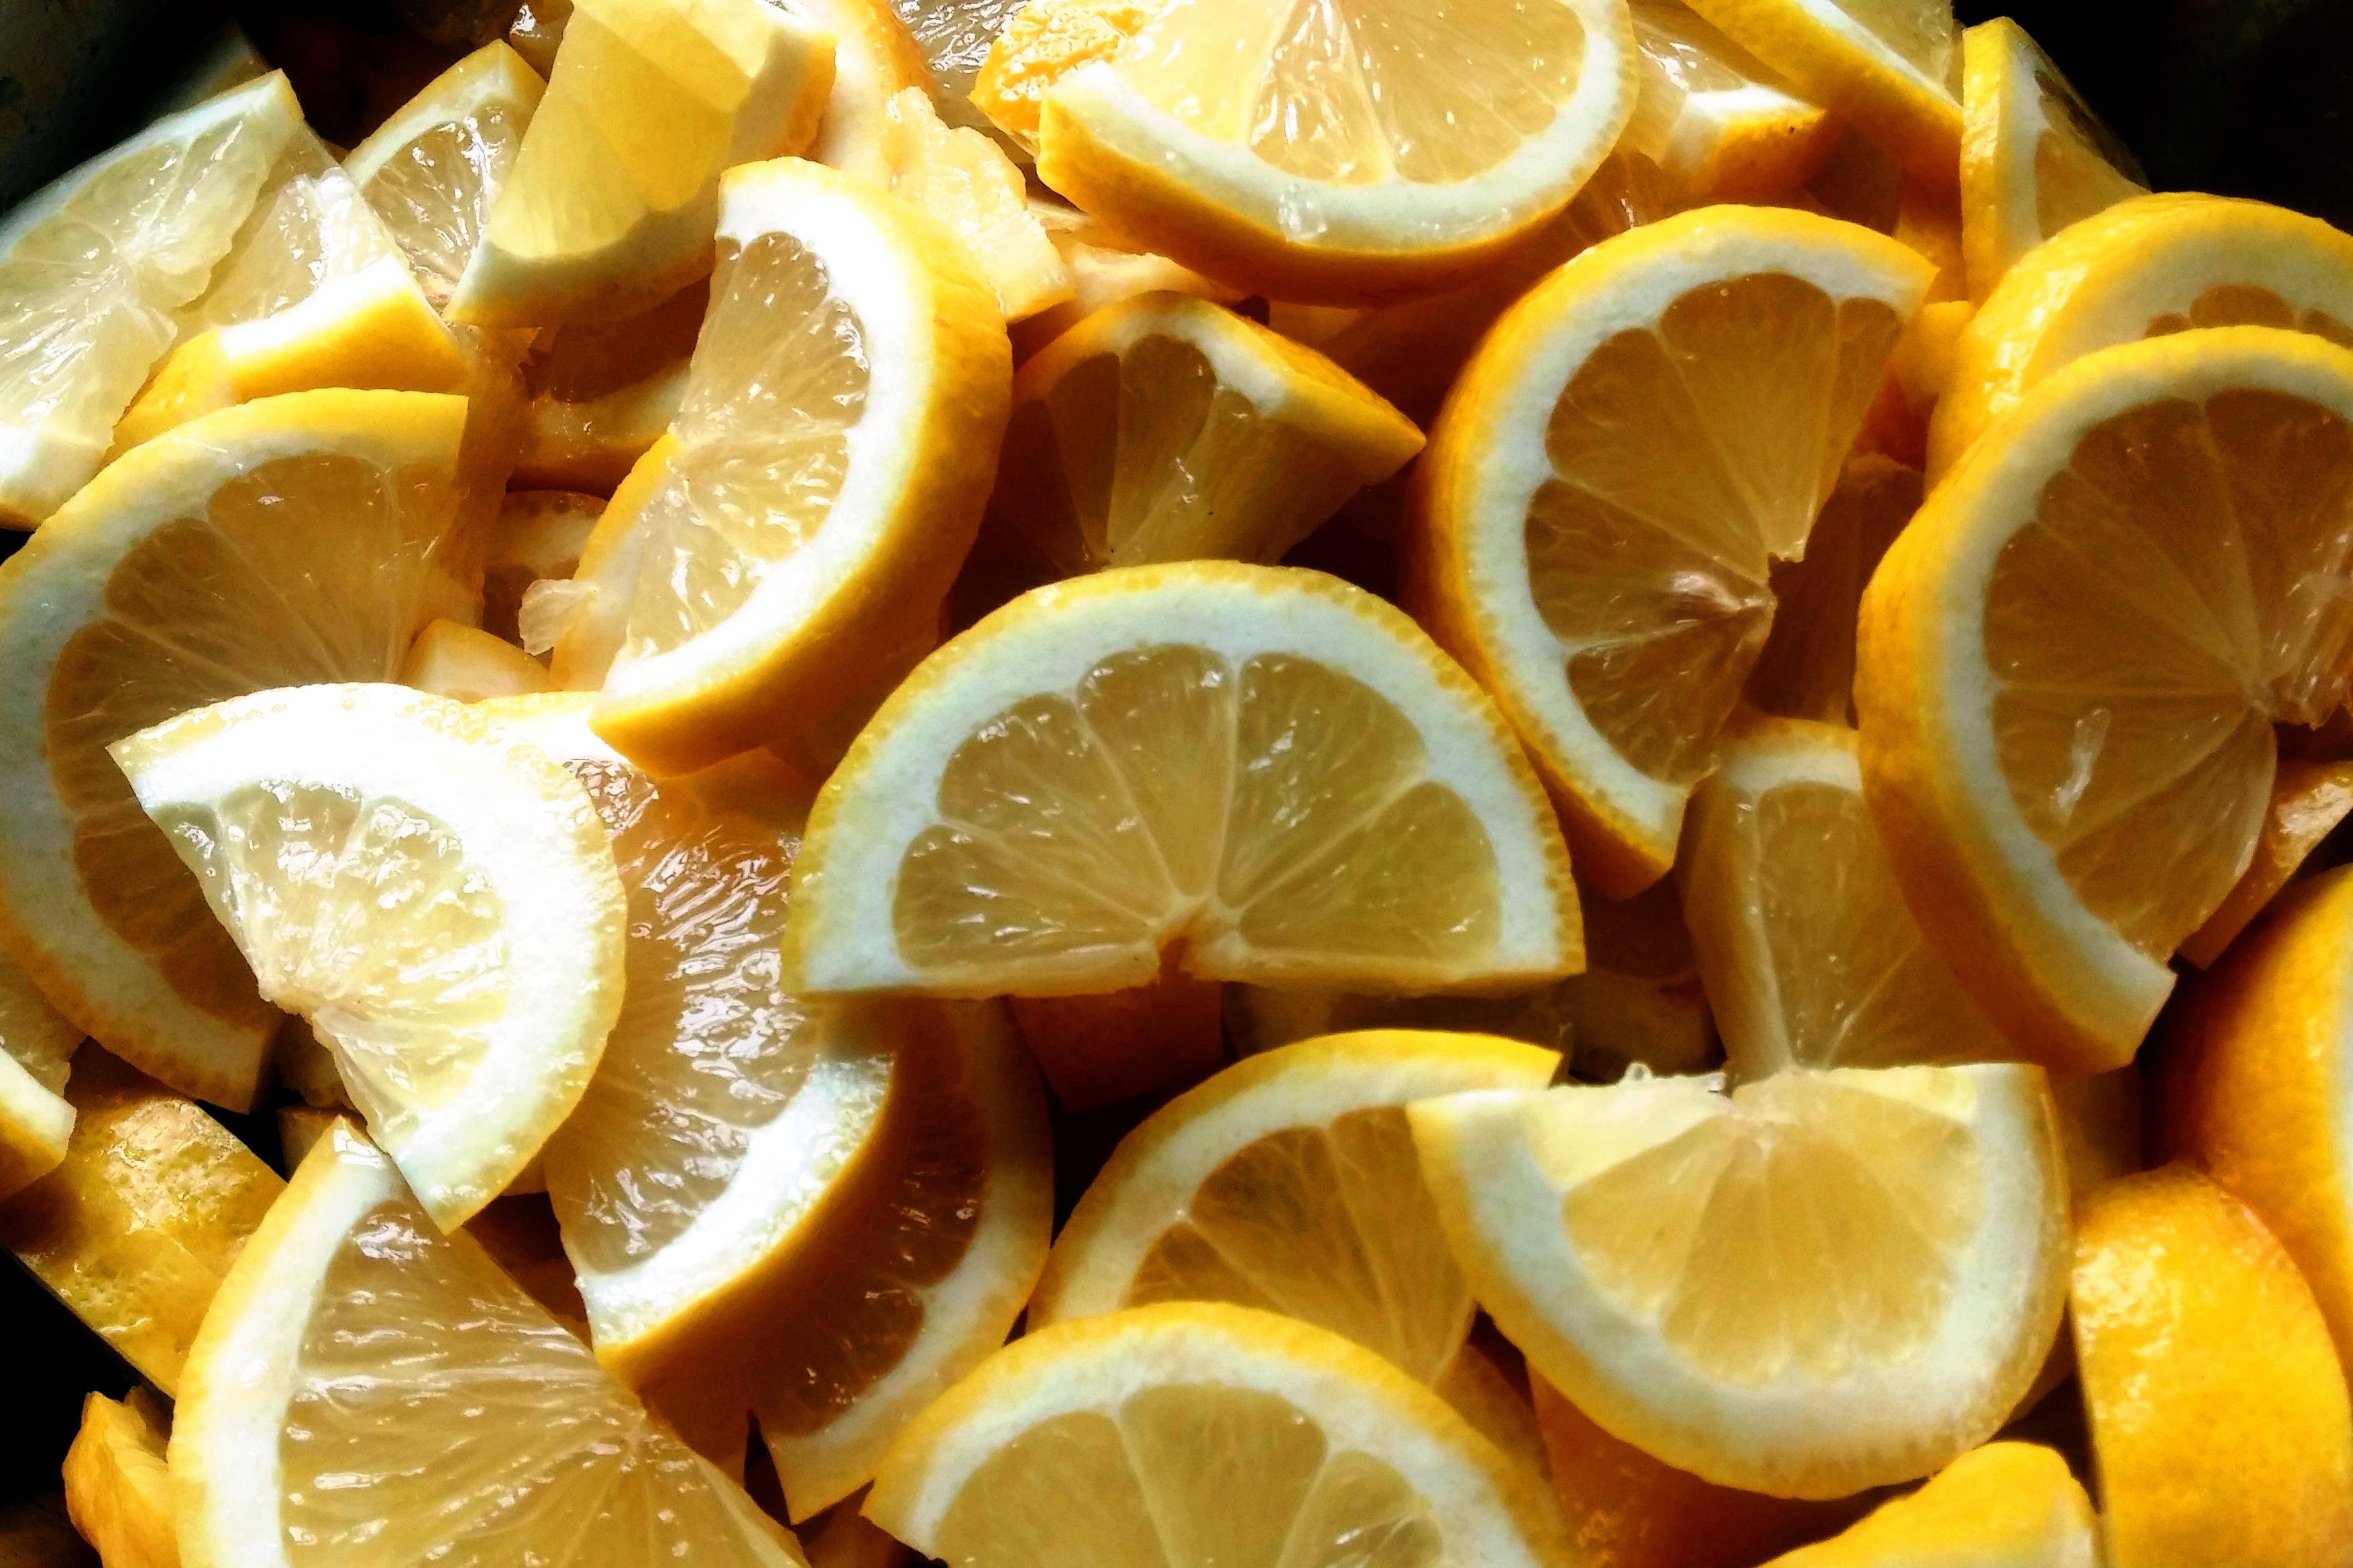 Citrusy a citrusová kůra